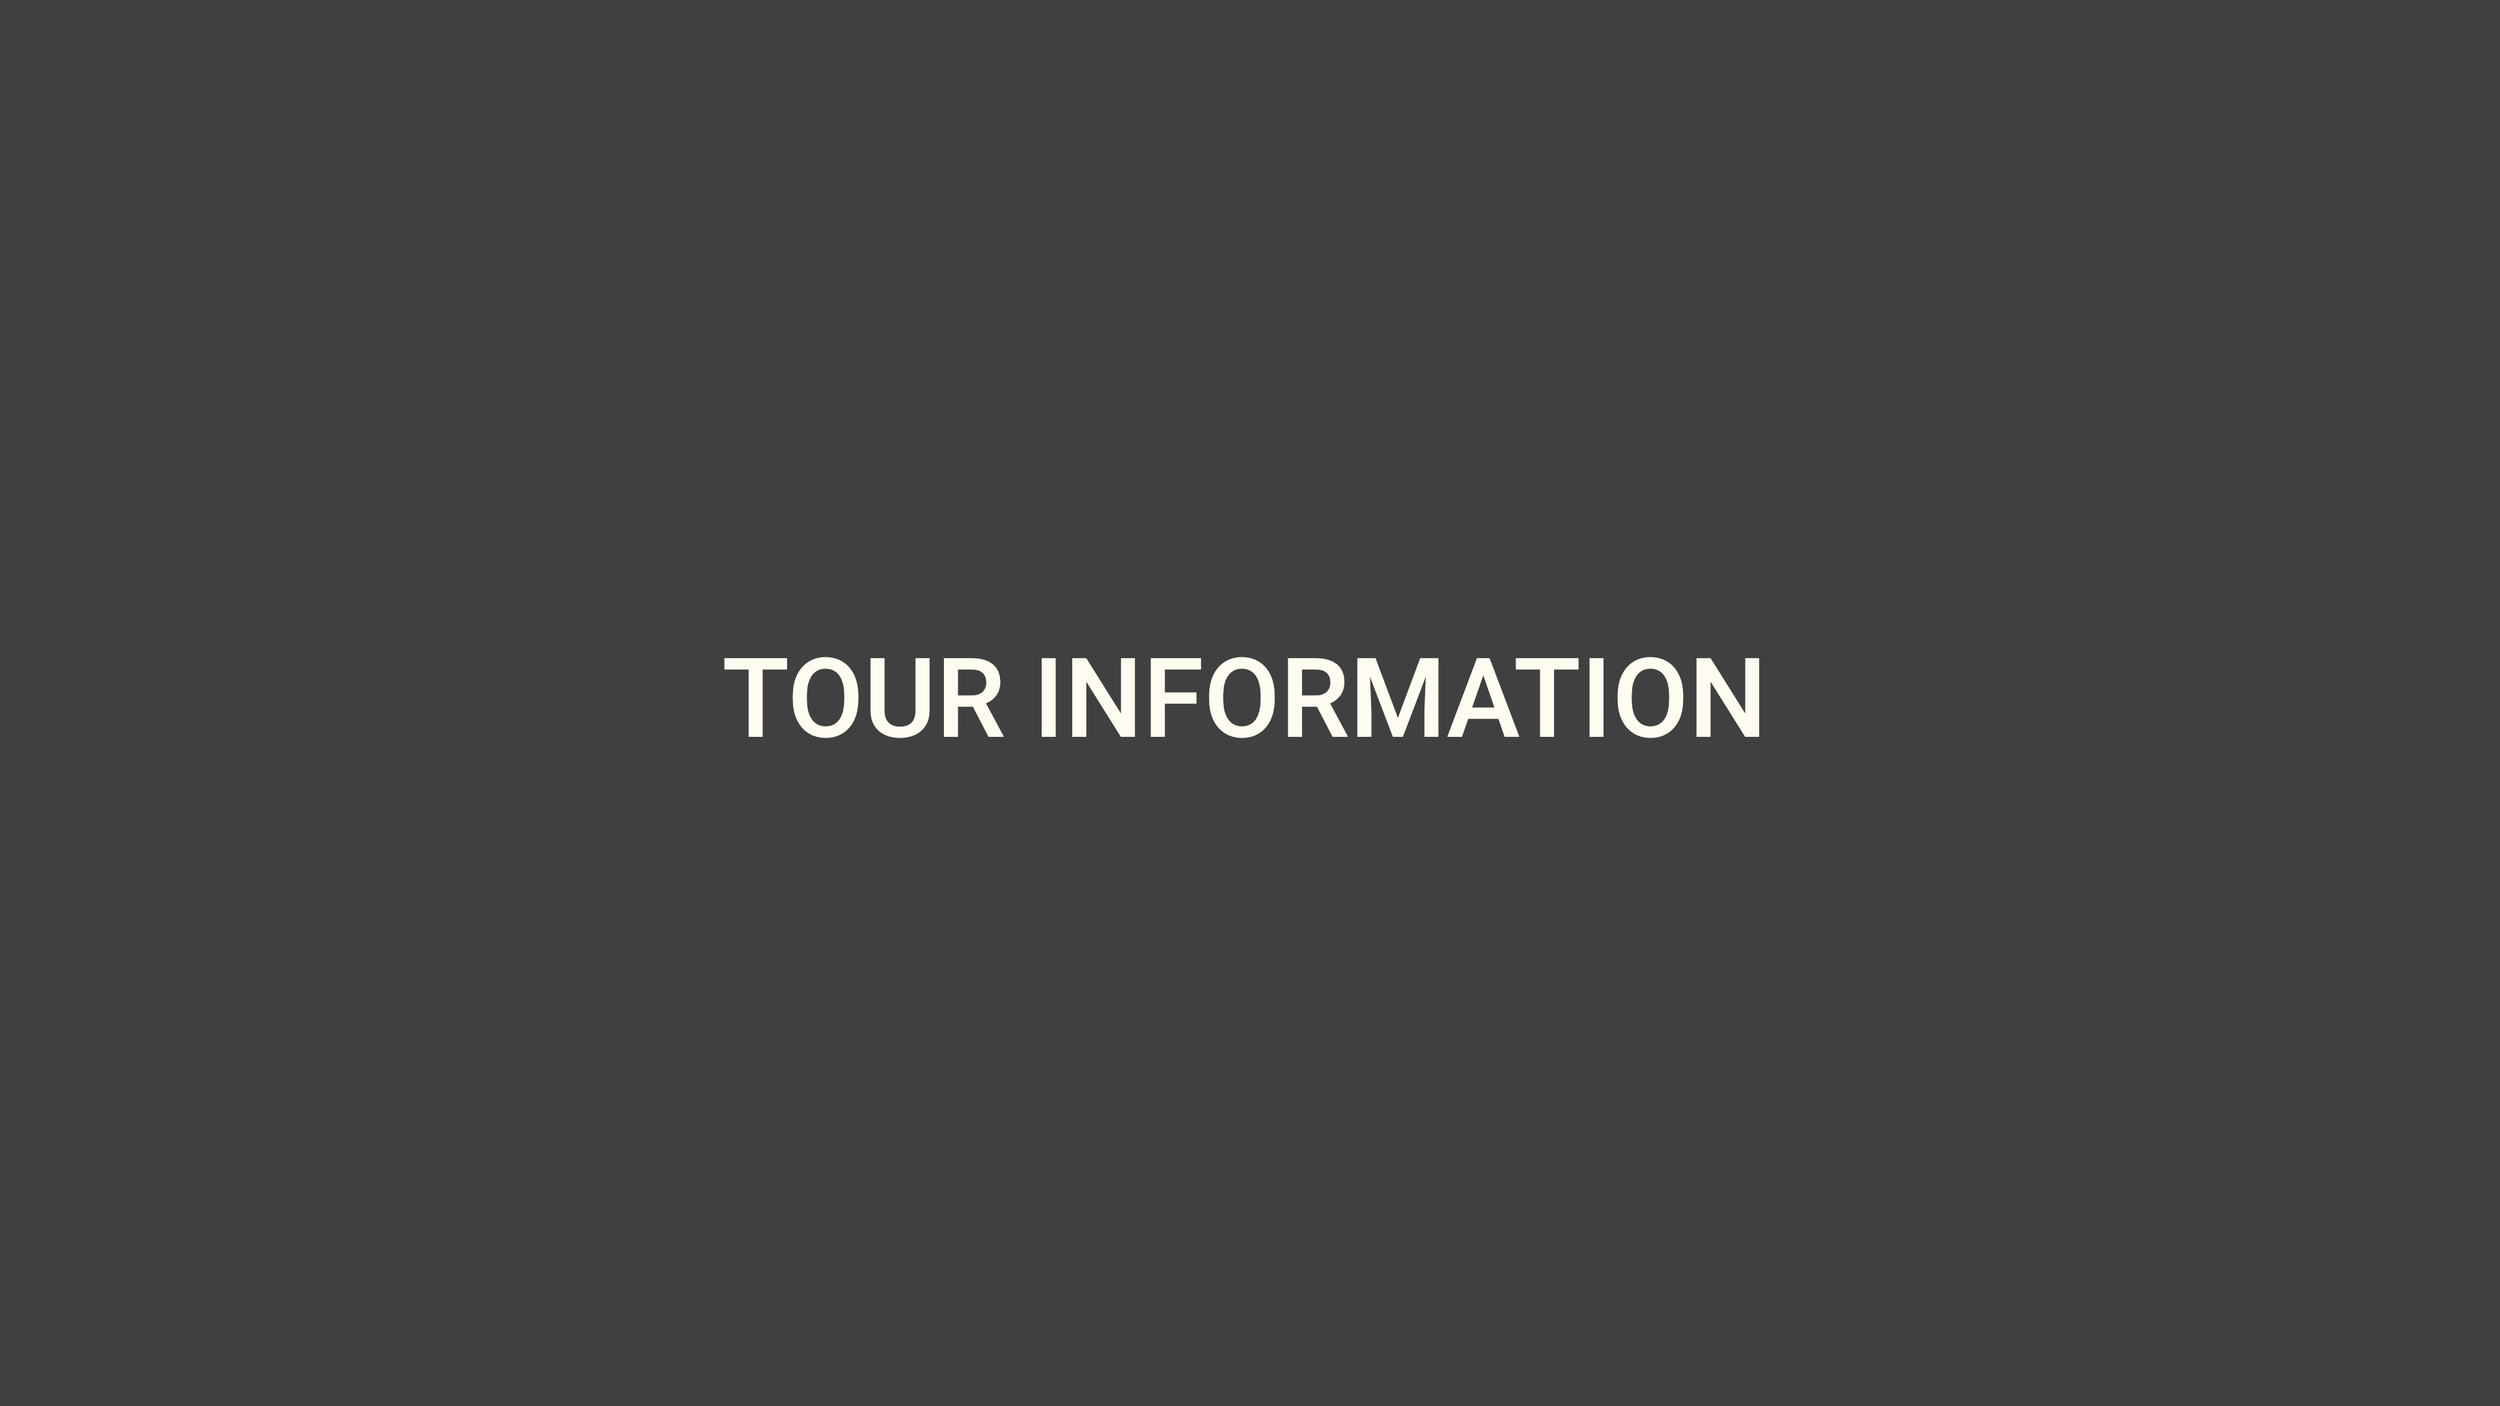 Tour Information font 170.png